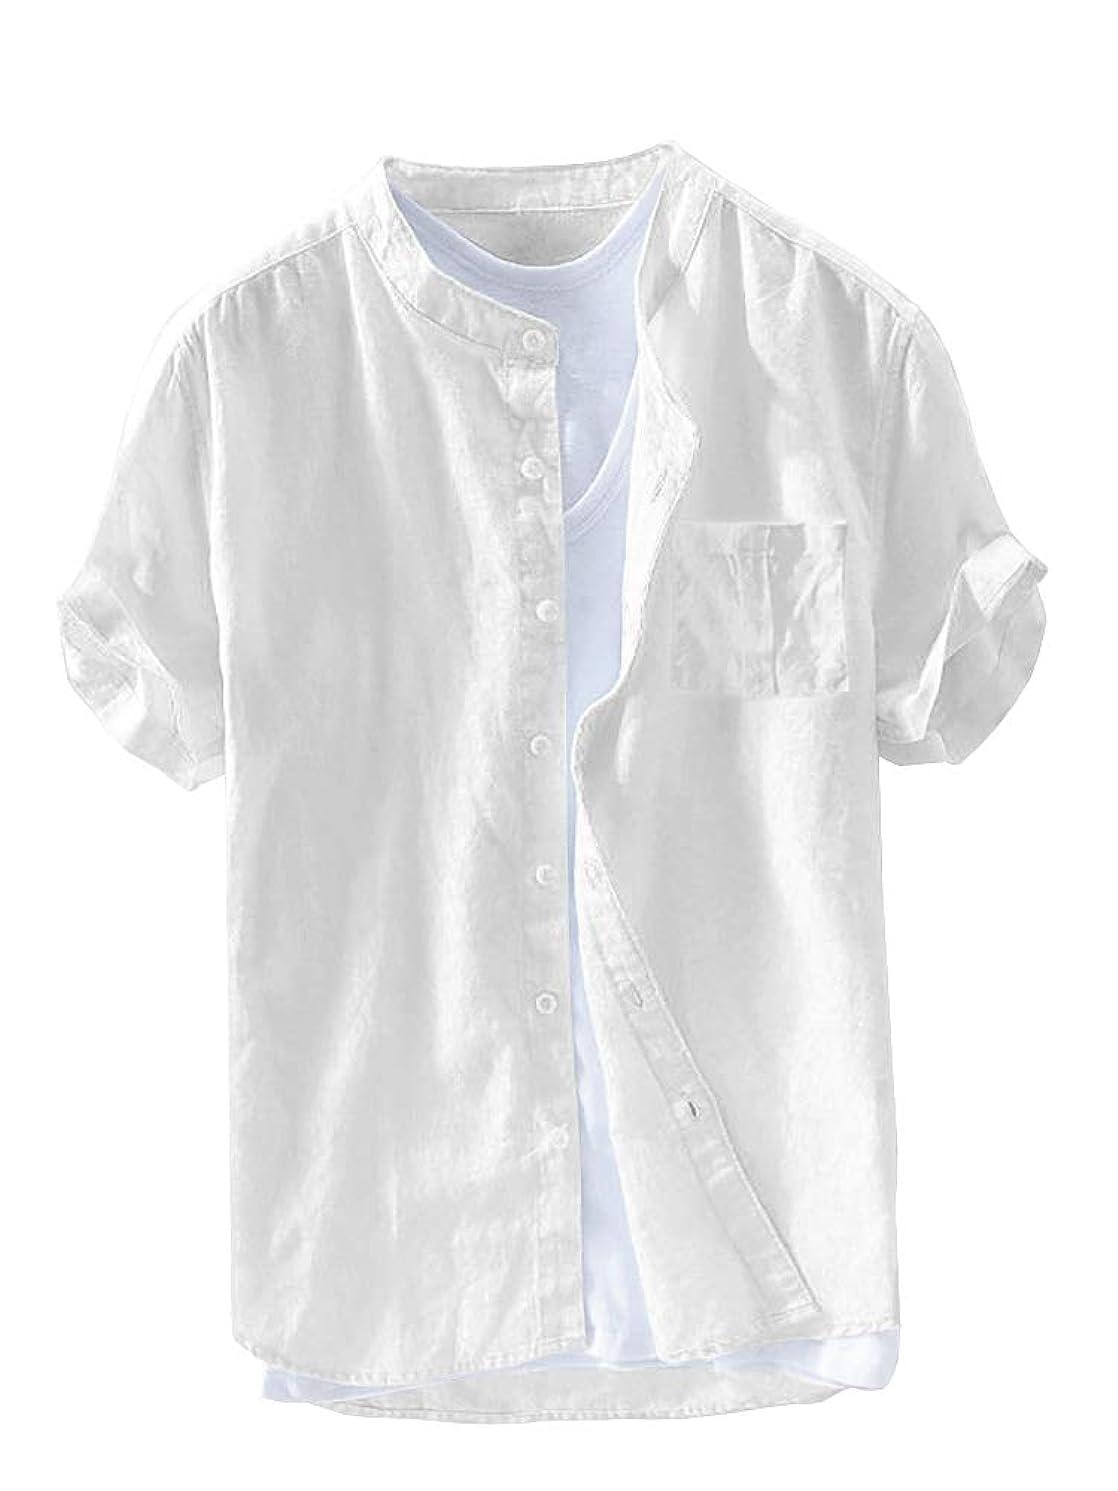 Beotyshow Mens Mandarin Collar Short Sleeve Shirts Casual Summer Linen Pullover Henley Shirt Plain Poplin Tops for Men